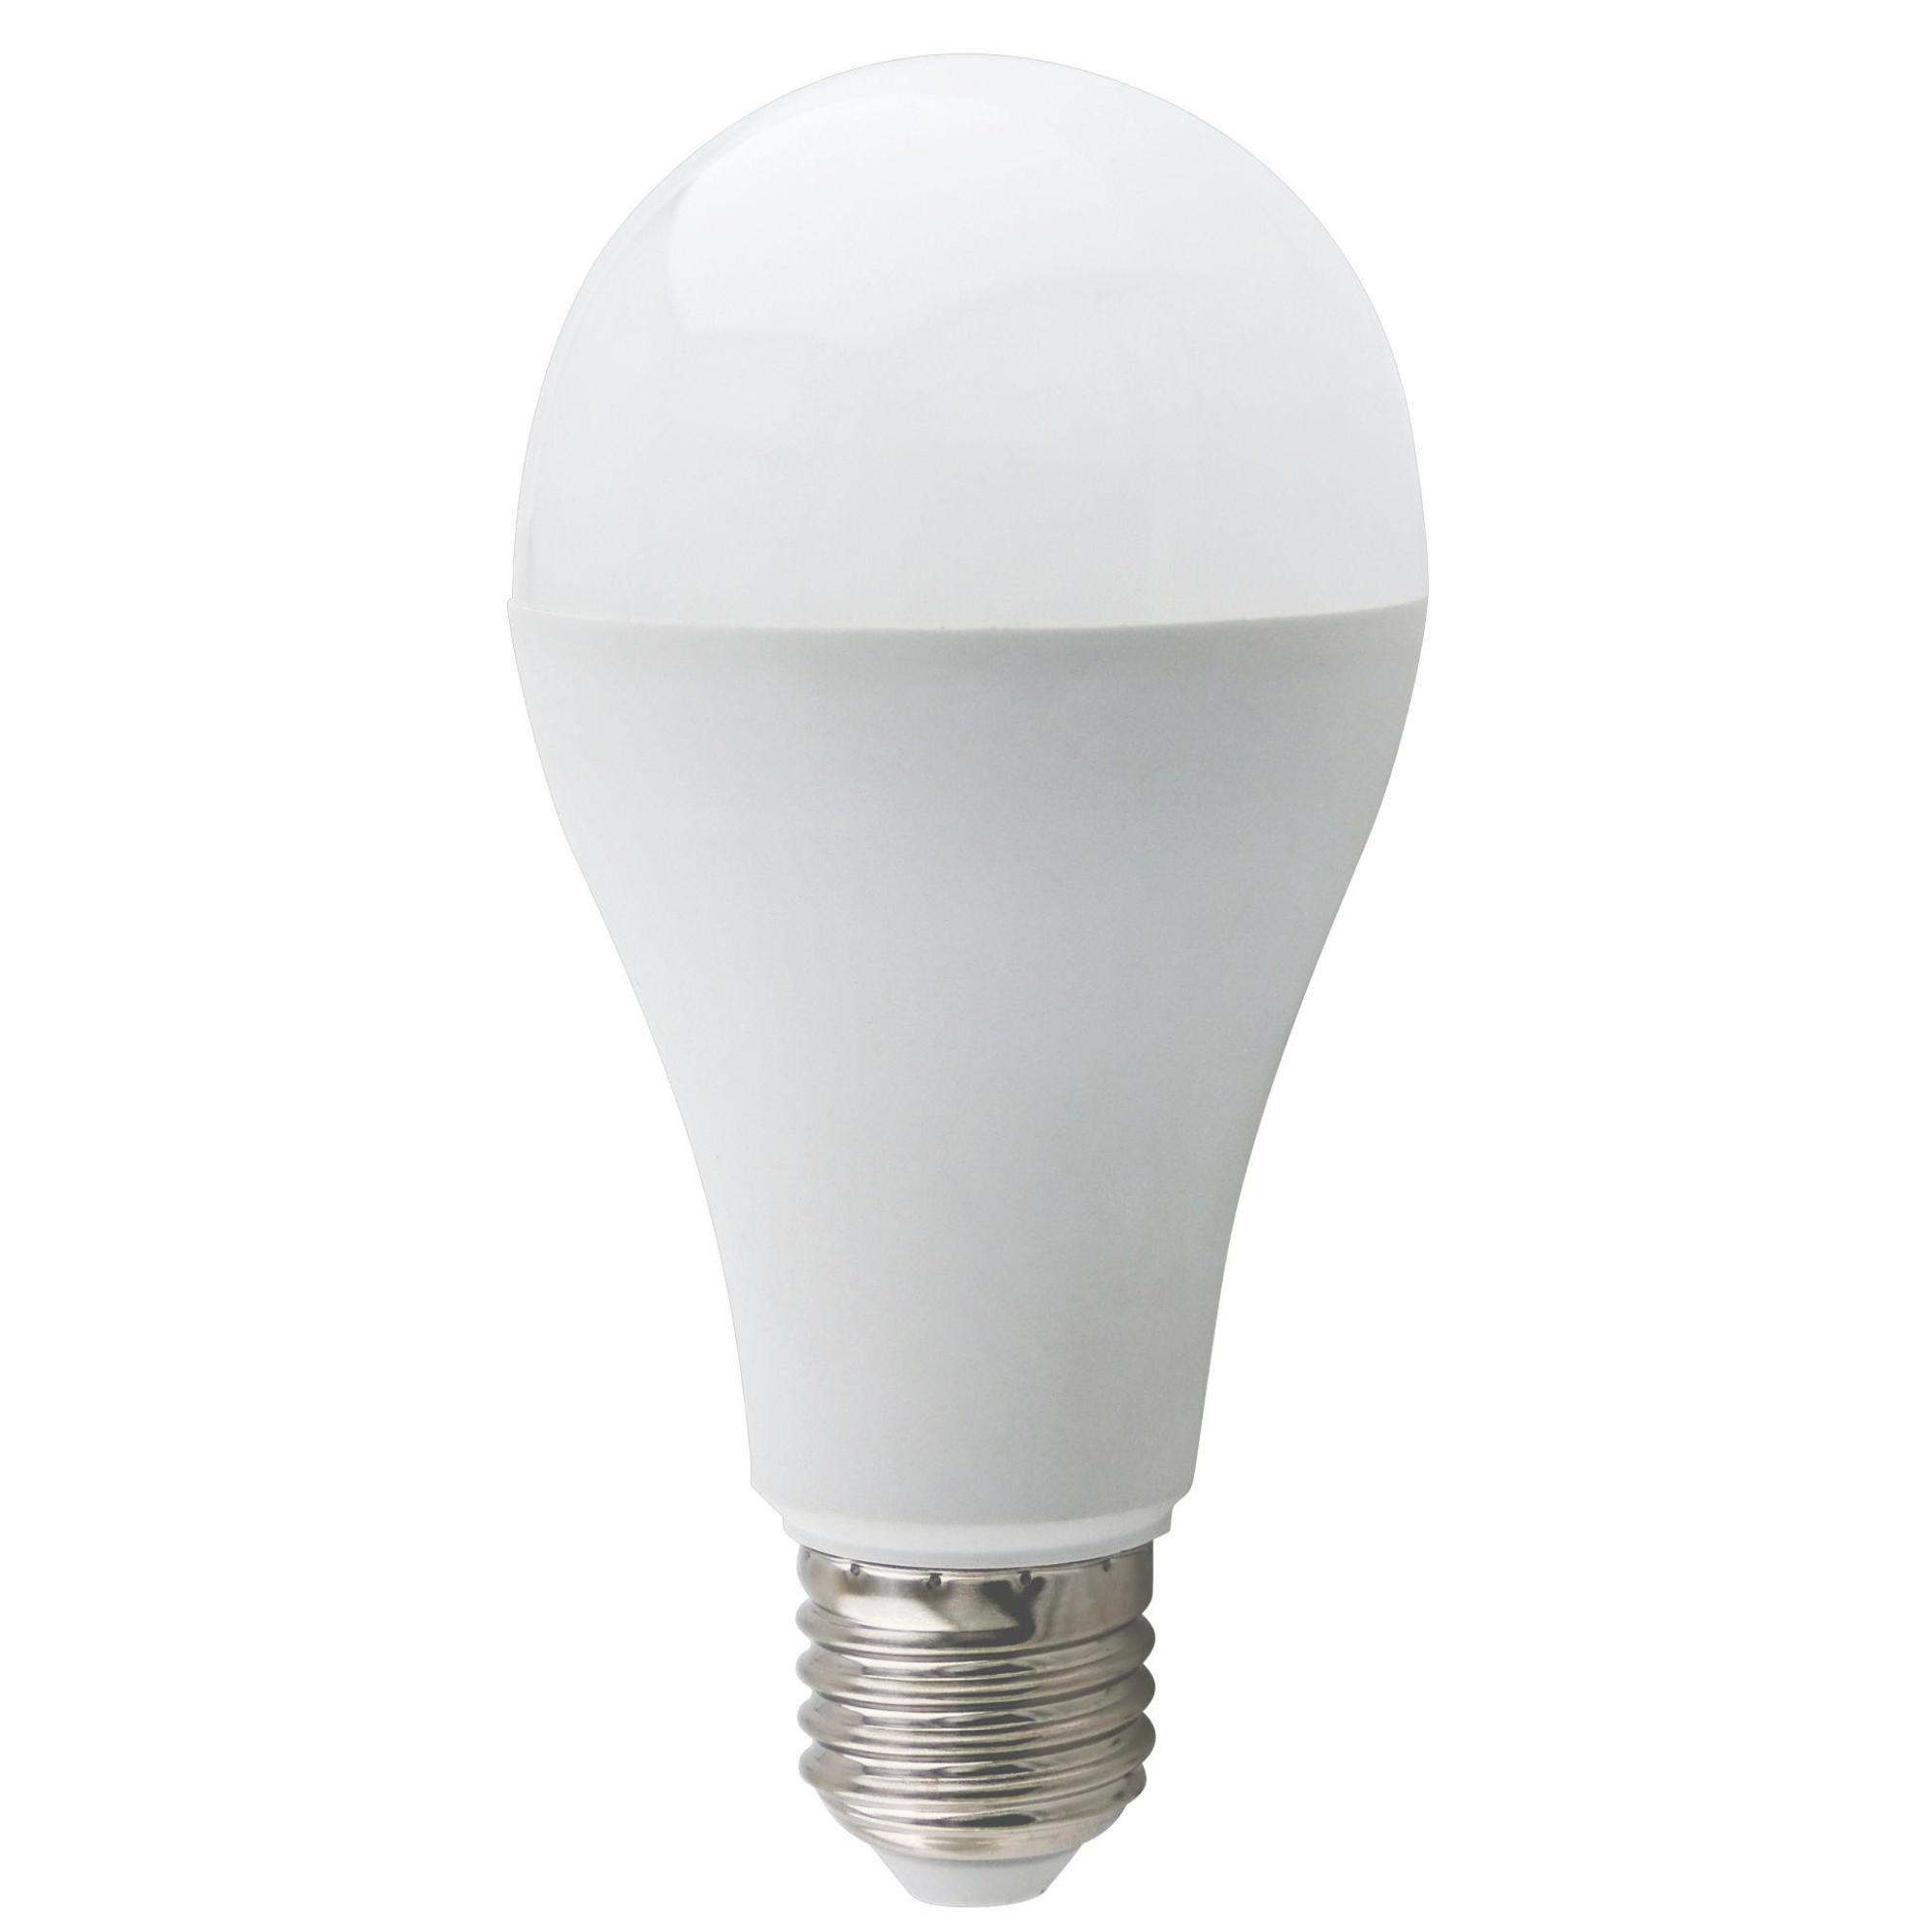 Лампа Ecola Premium светодионая E27 20 Вт груша 1800 Лм теплый свет